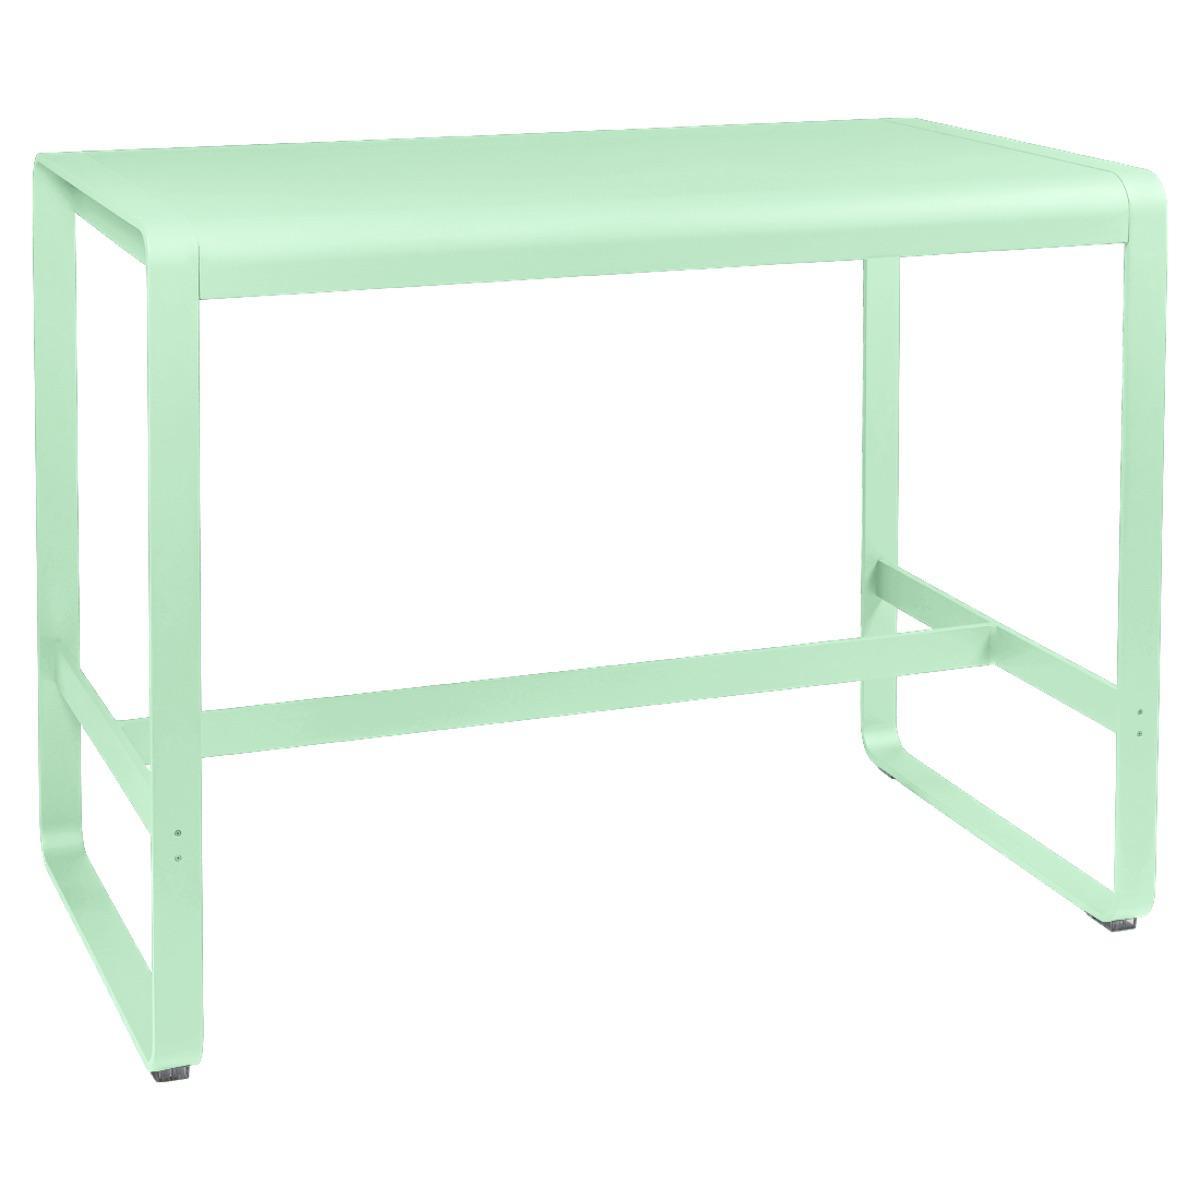 Table haute 80x140cm BELLEVIE Fermob vert opaline